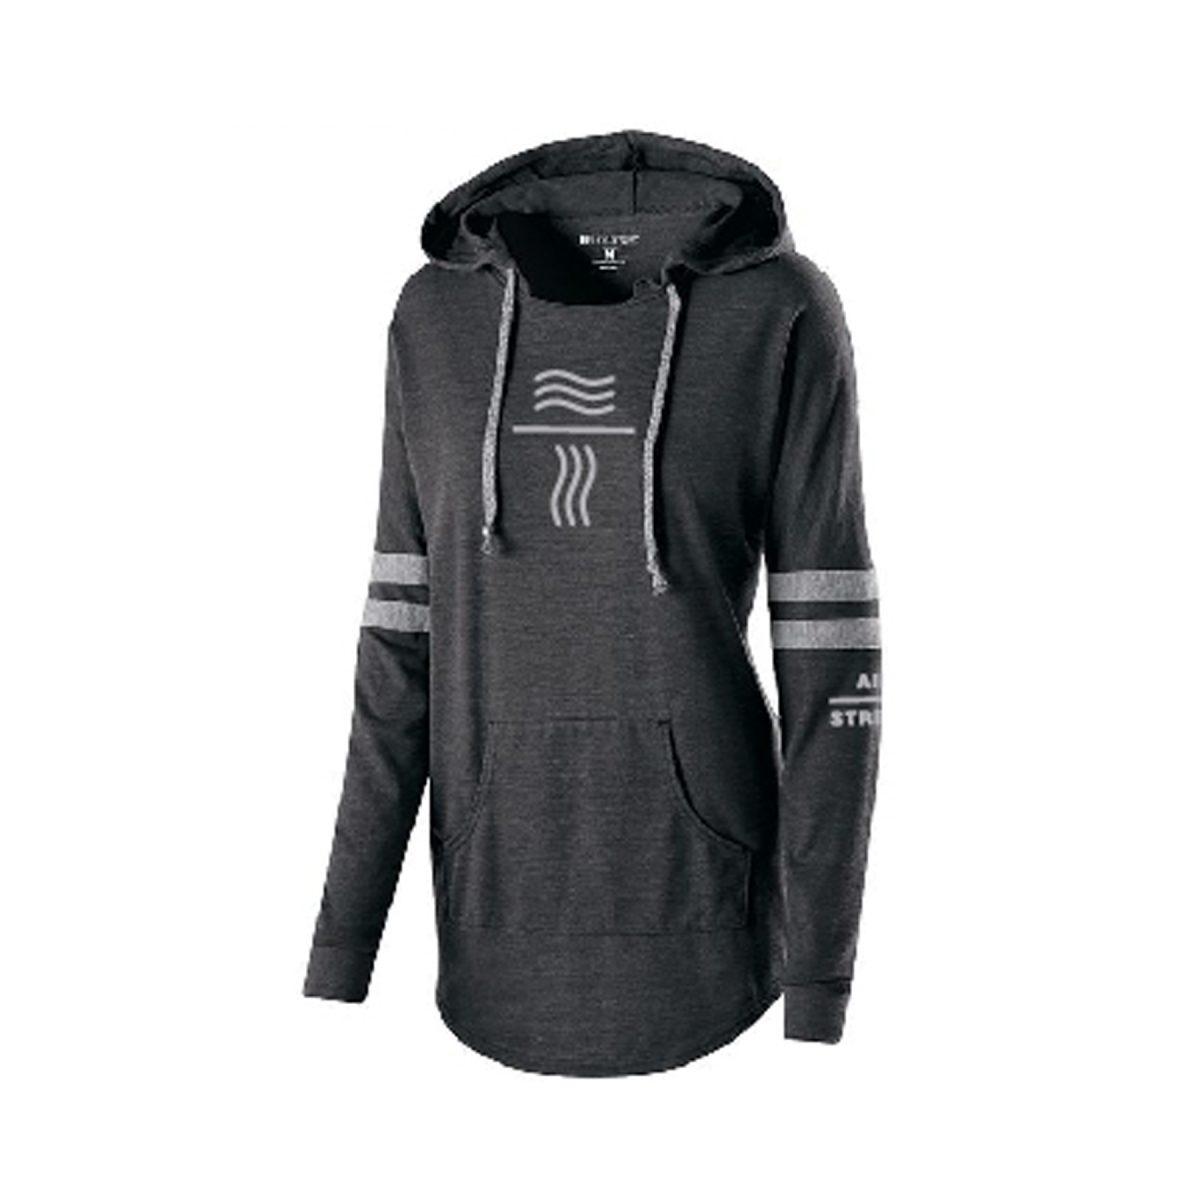 final augusta womens sporty hoodie wavy lines logo